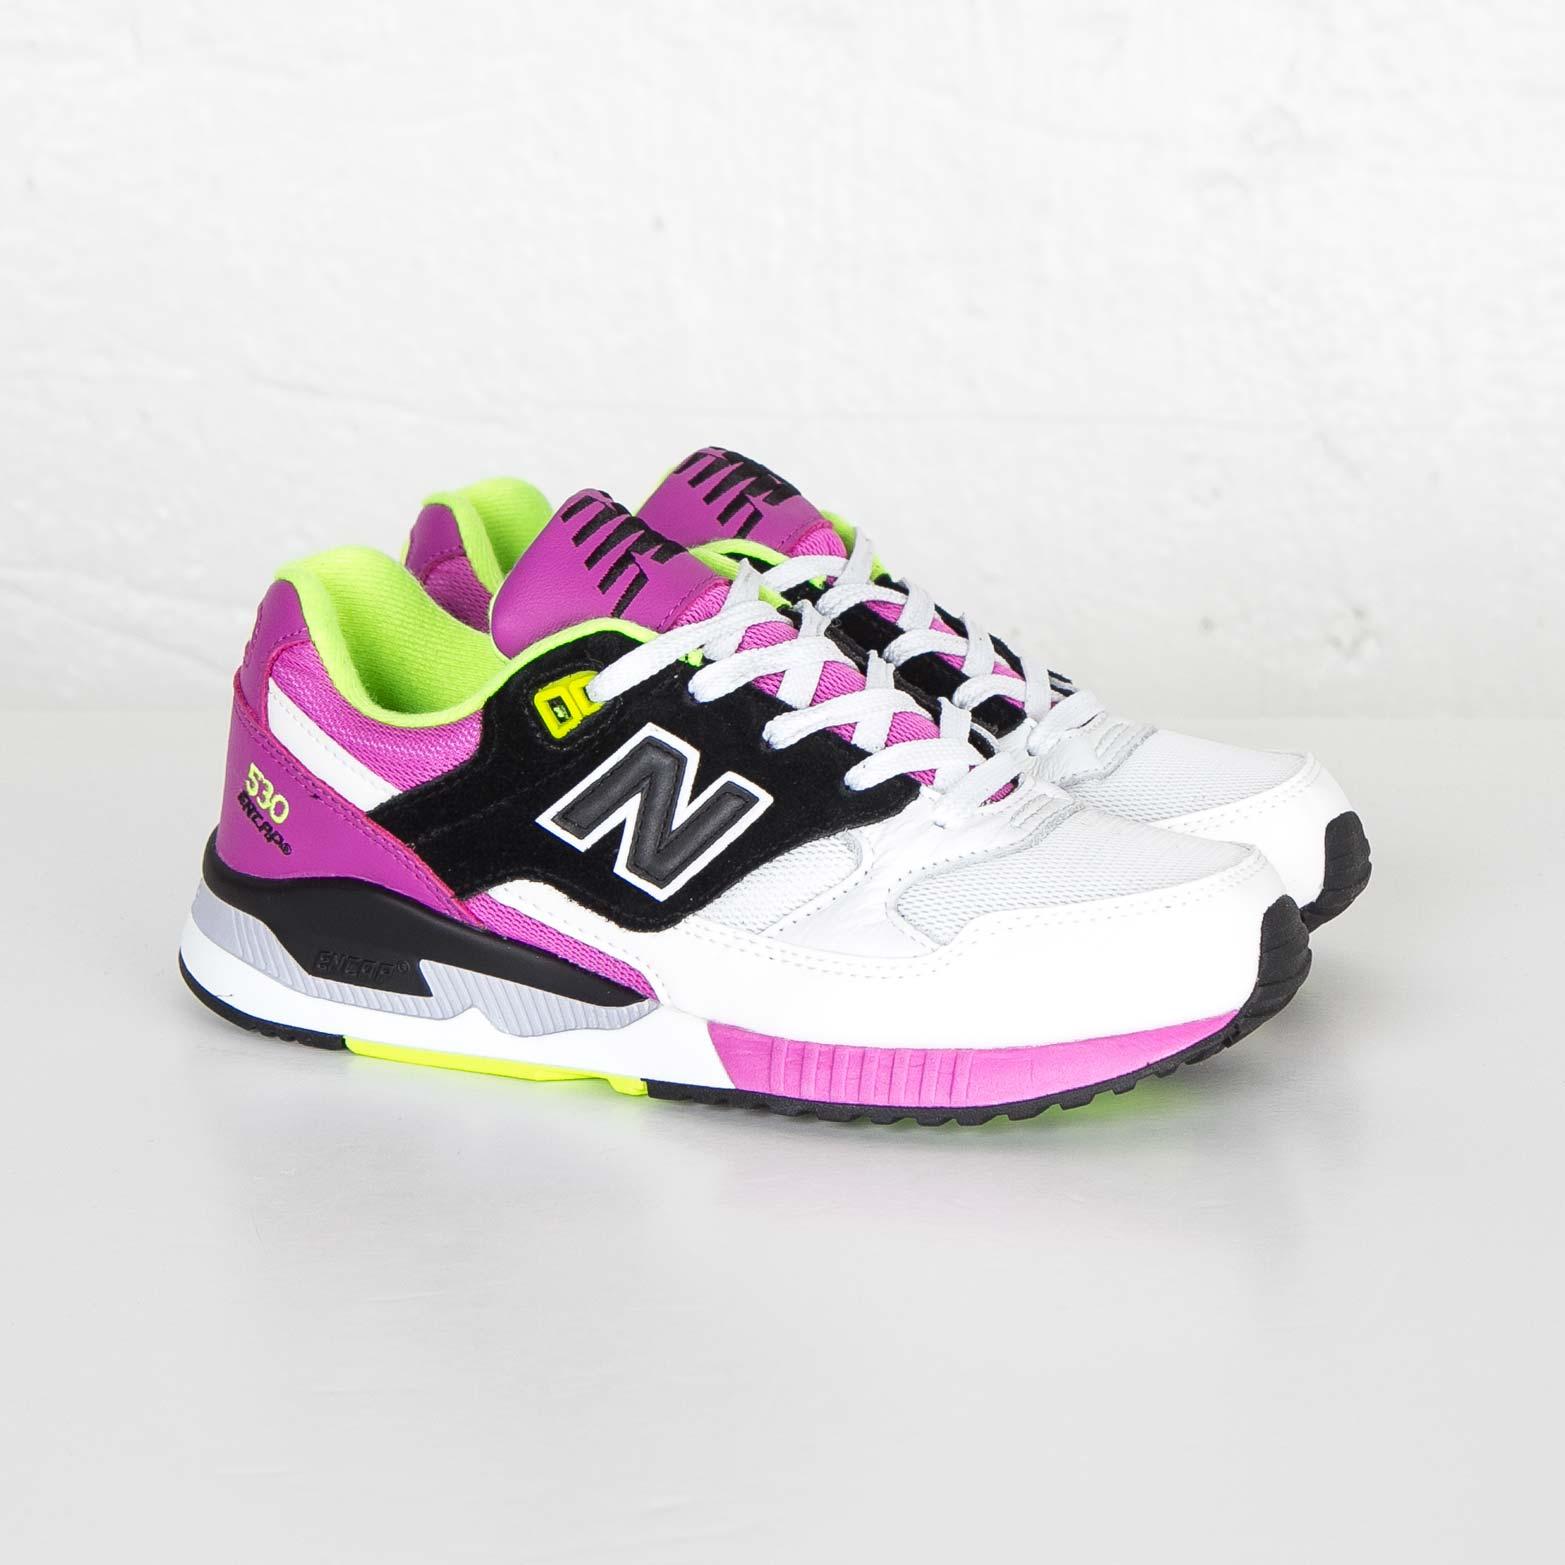 acheter populaire ca2b3 55e08 New Balance W530 - W530bob - Sneakersnstuff | sneakers ...